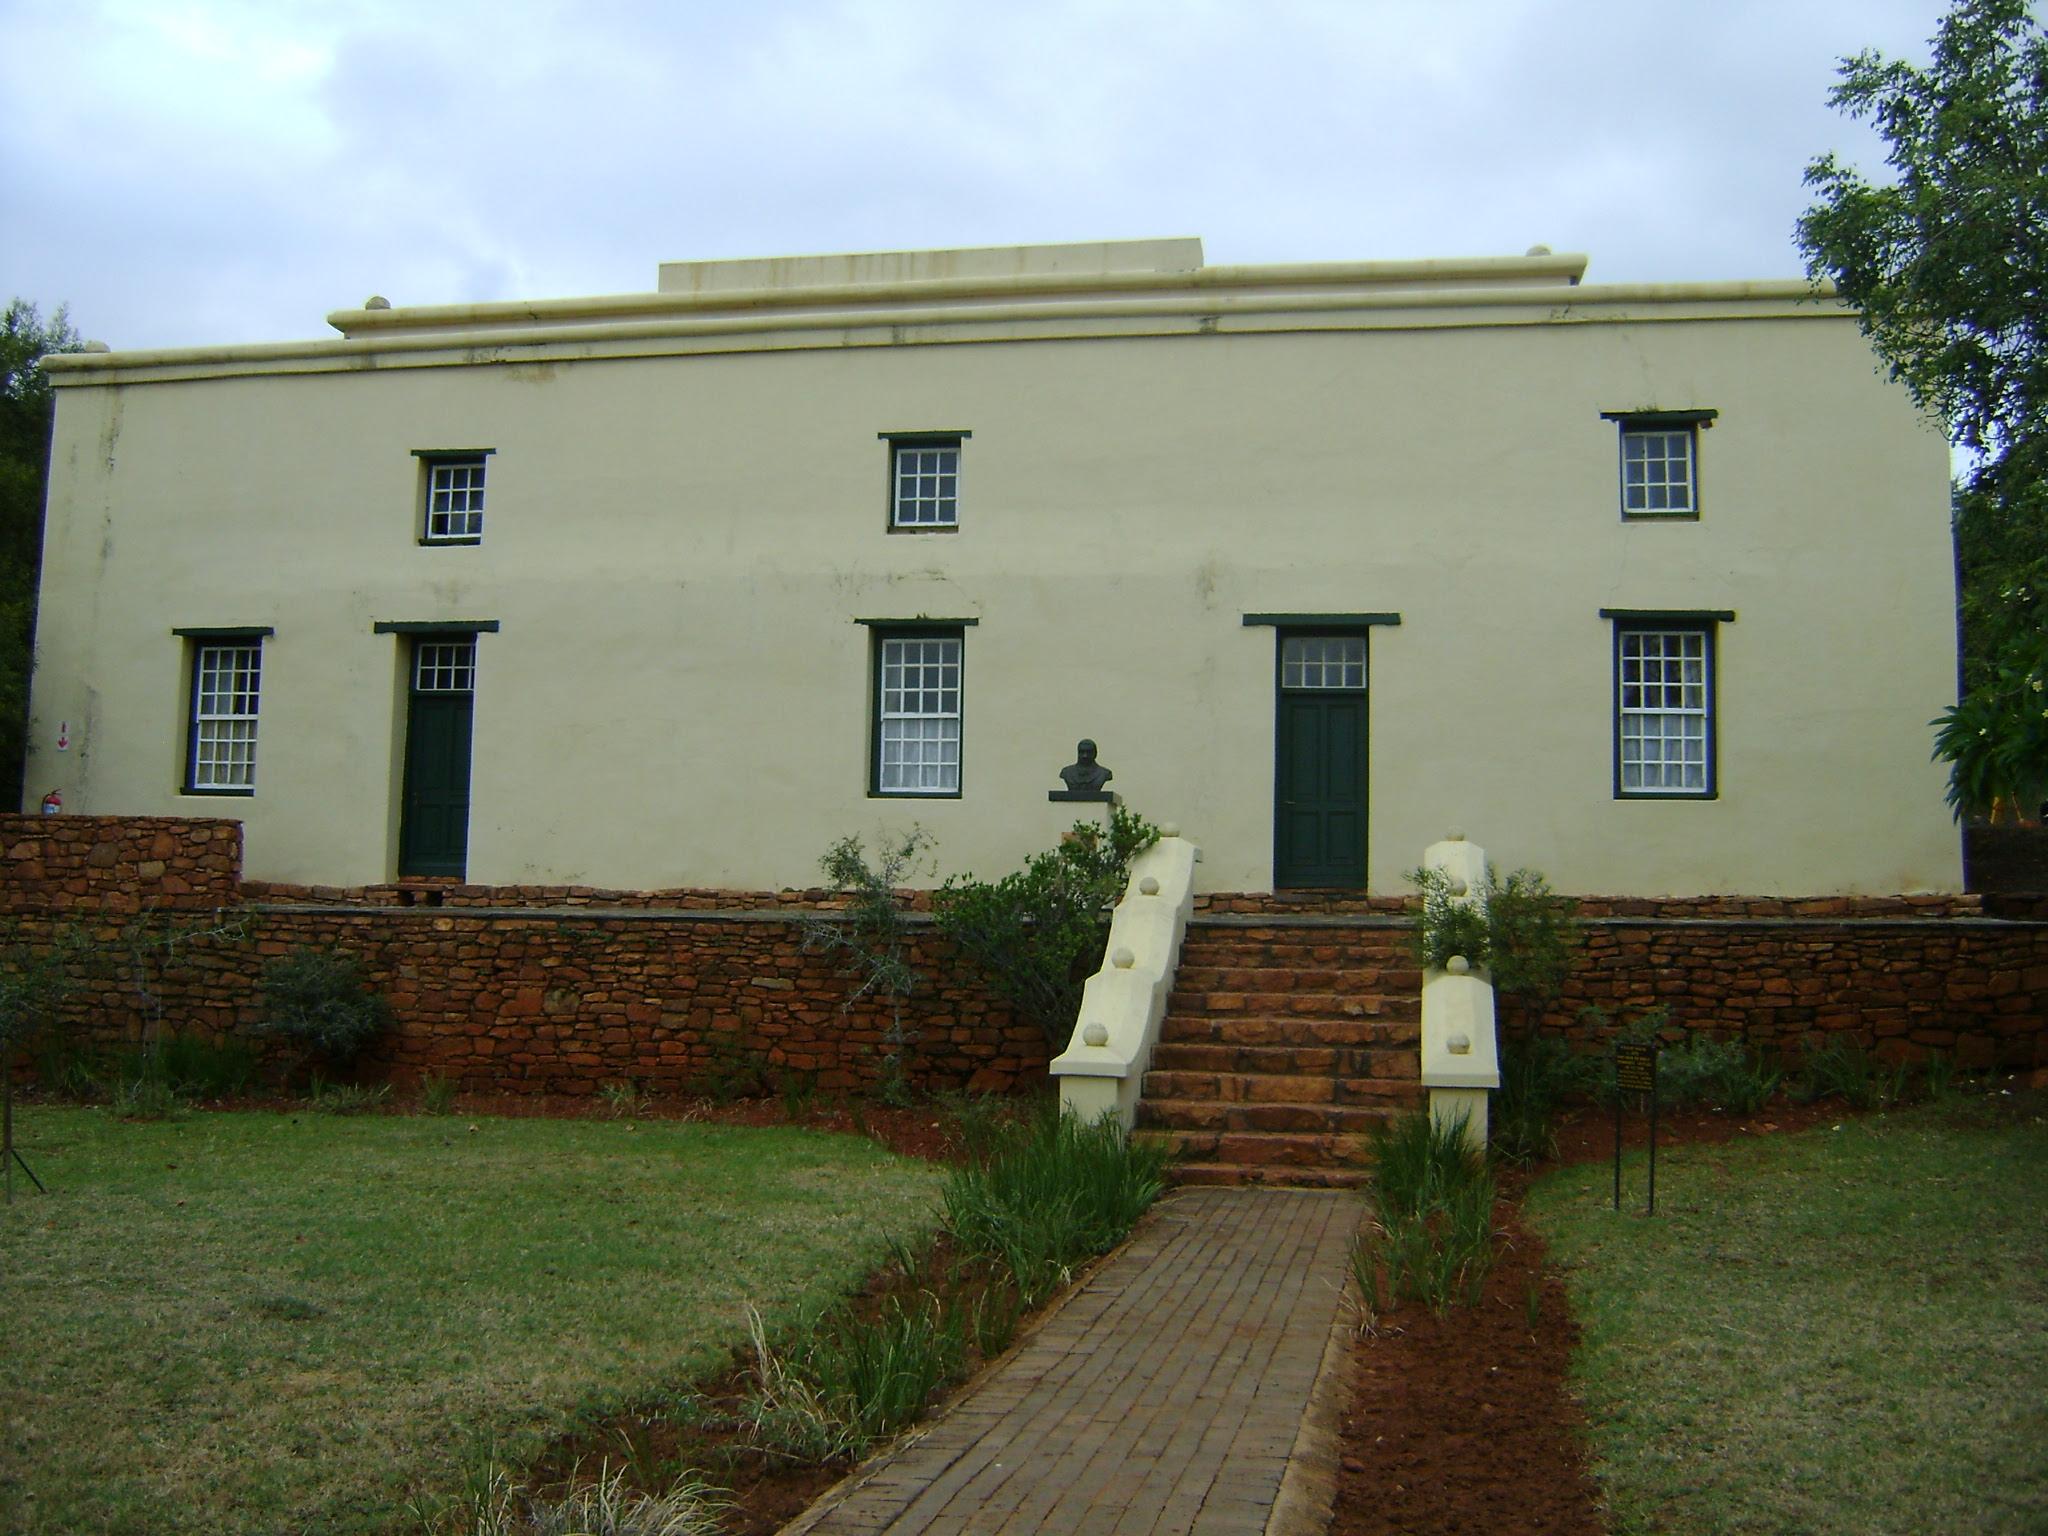 http://tuksarchaeology.files.wordpress.com/2012/04/boekenhoutfontein-645.jpg